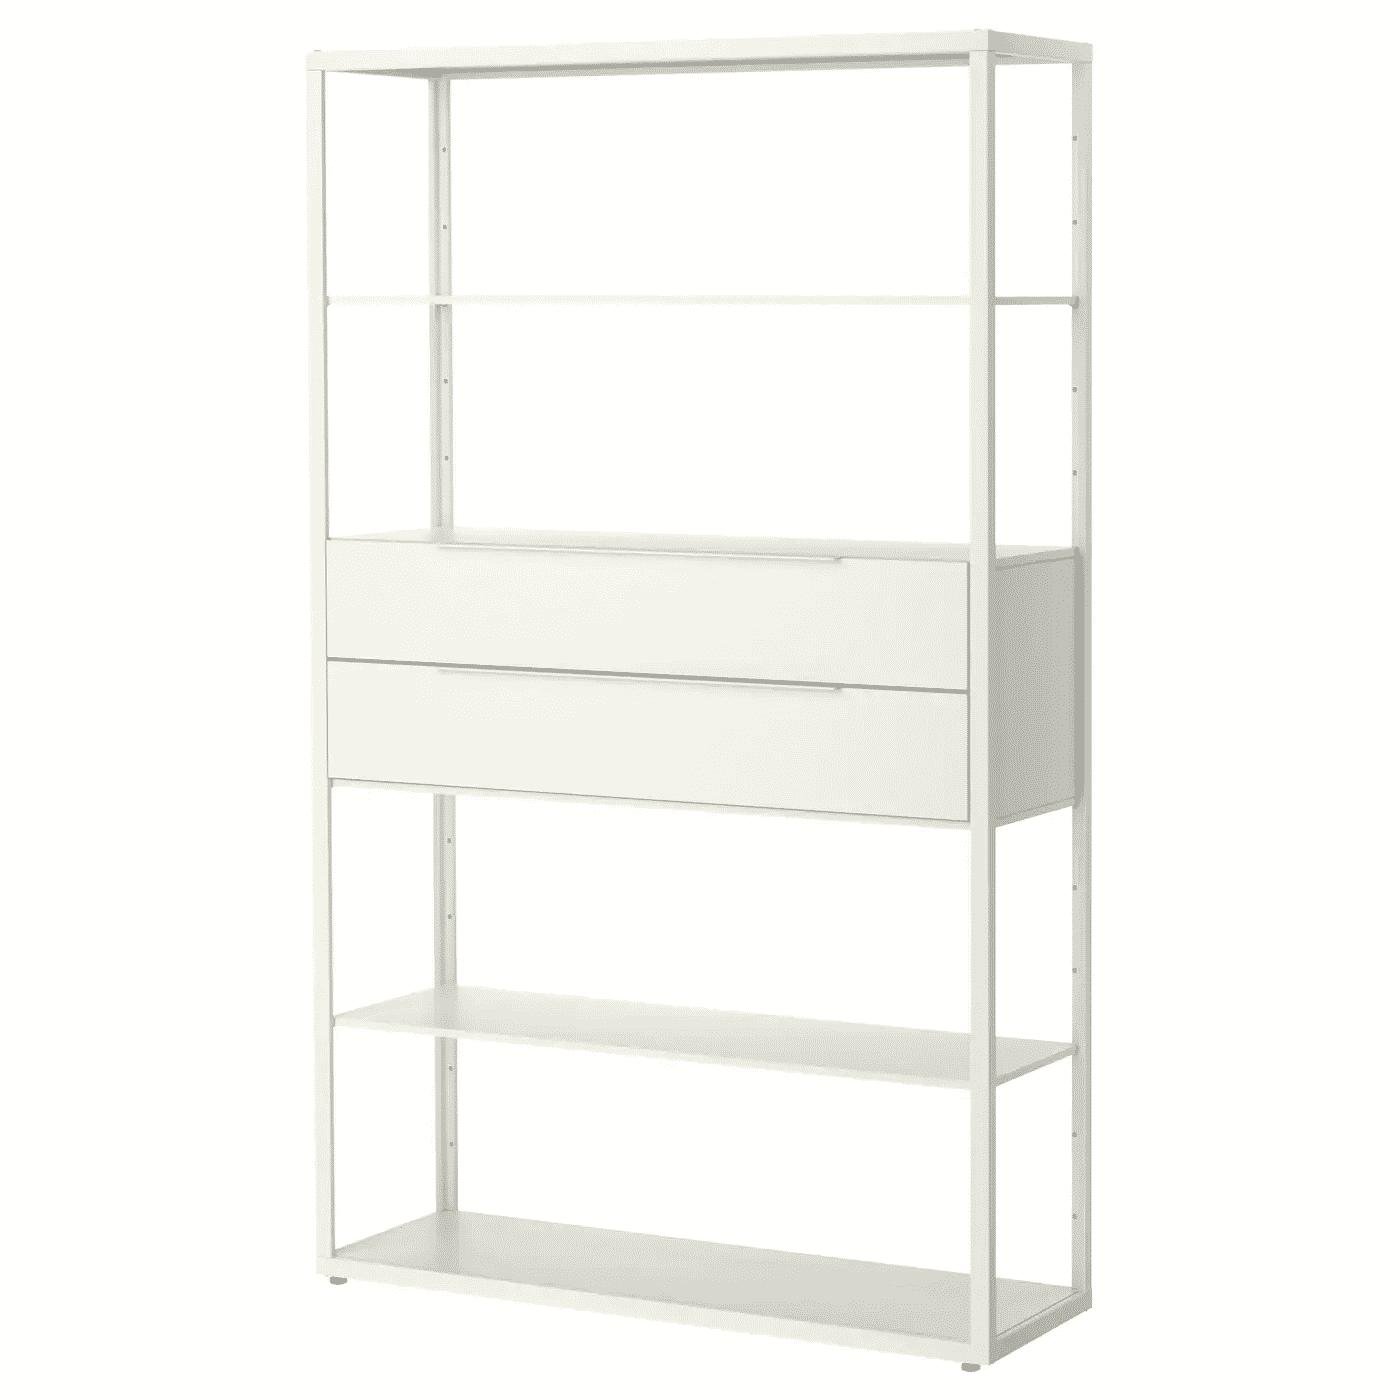 Fjalkinge Shelf